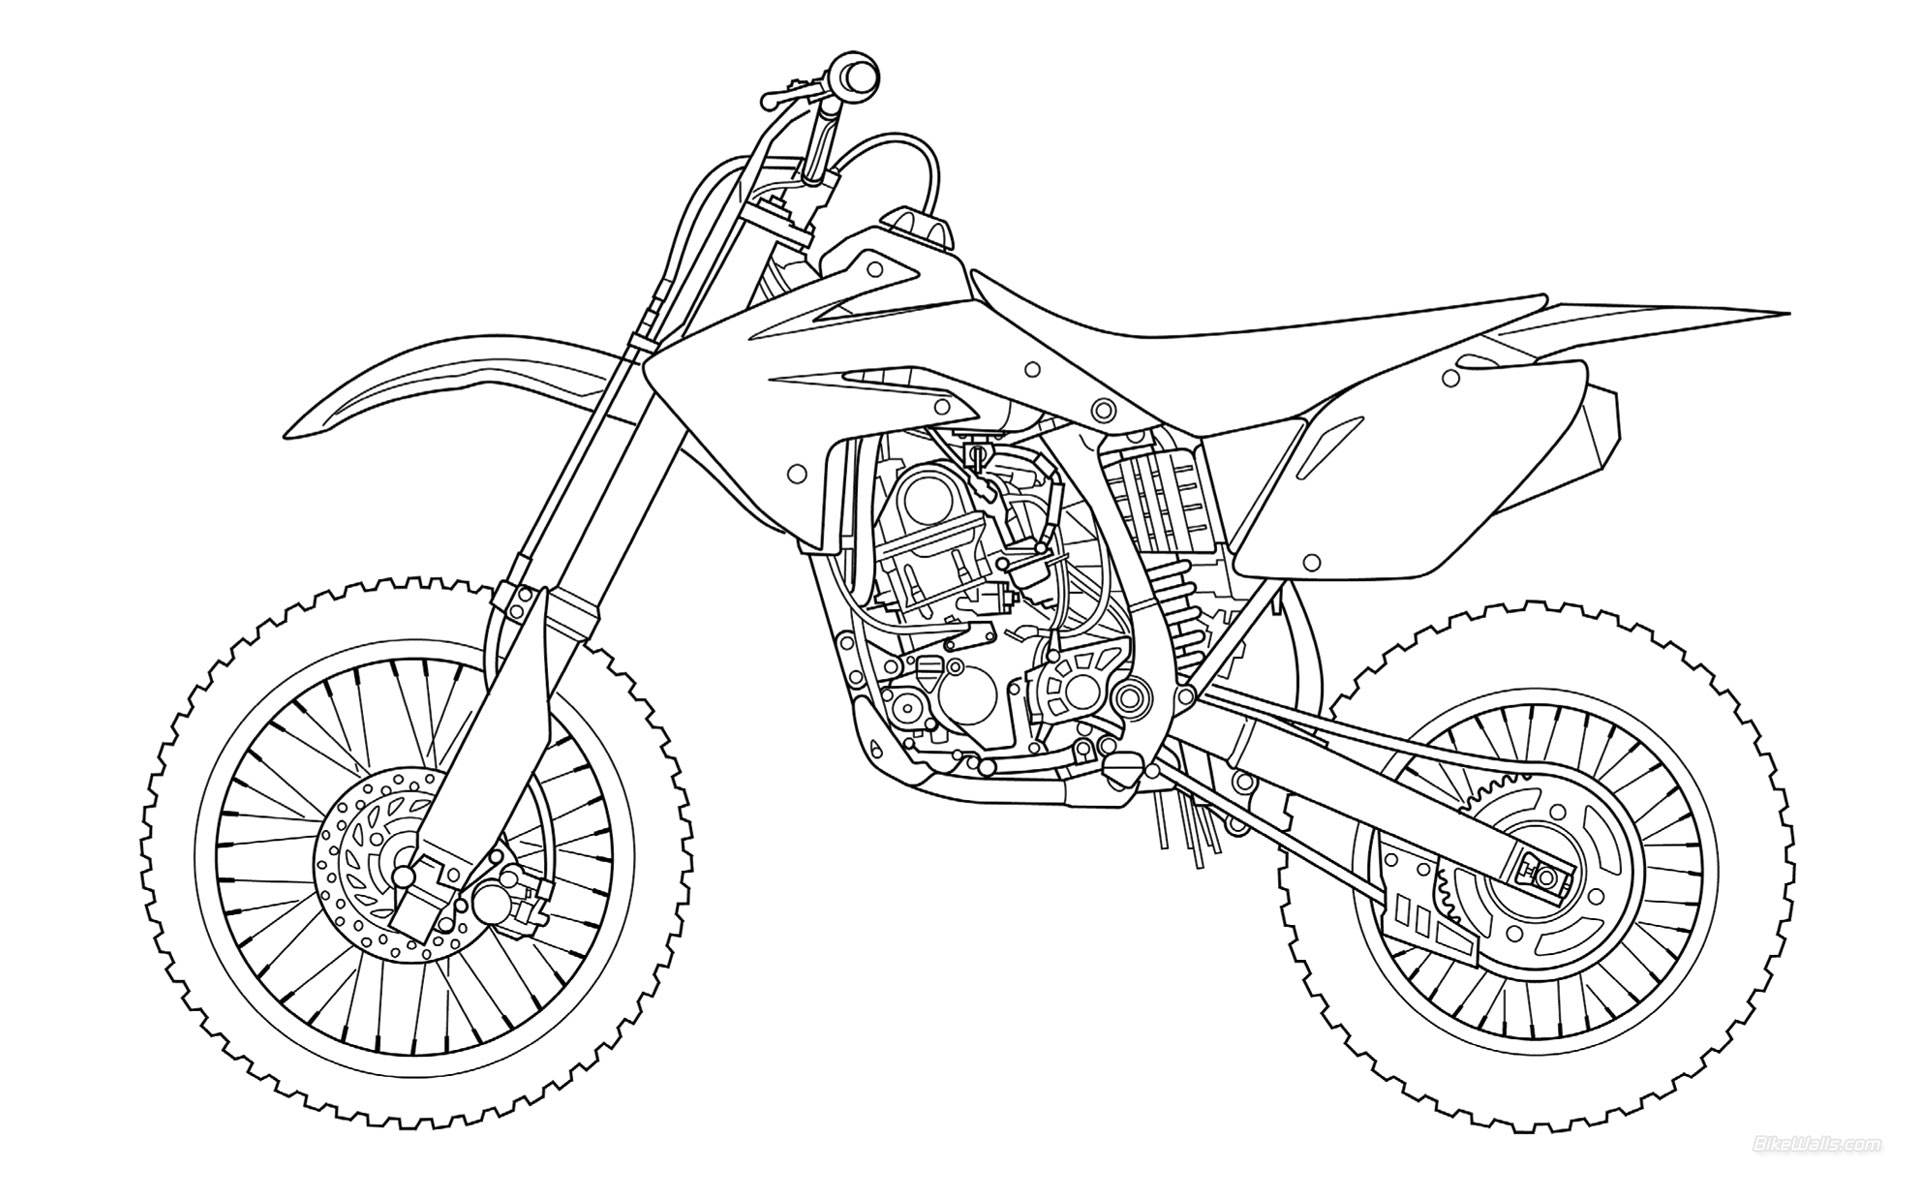 Coloriage motocross gratuit imprimer - Coloriage de cars gratuit ...